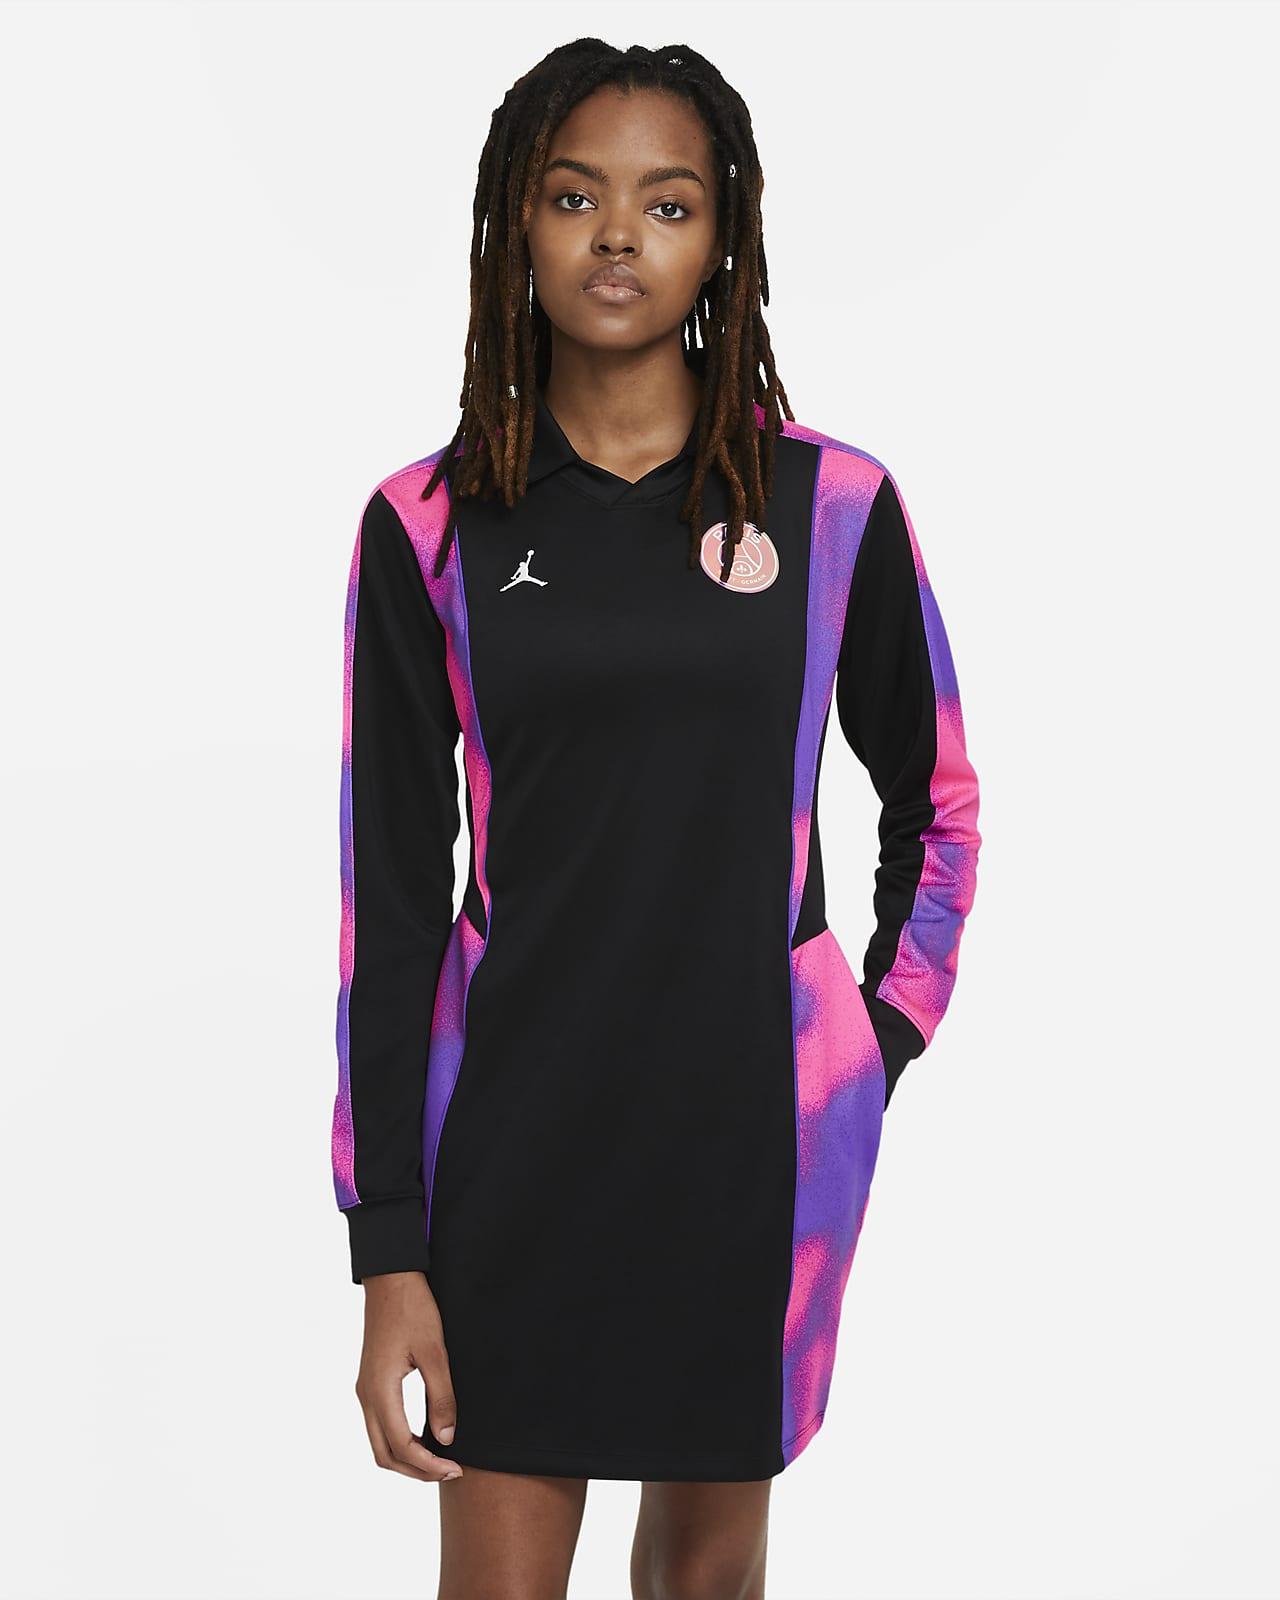 Abito in jersey Paris Saint-Germain - Donna